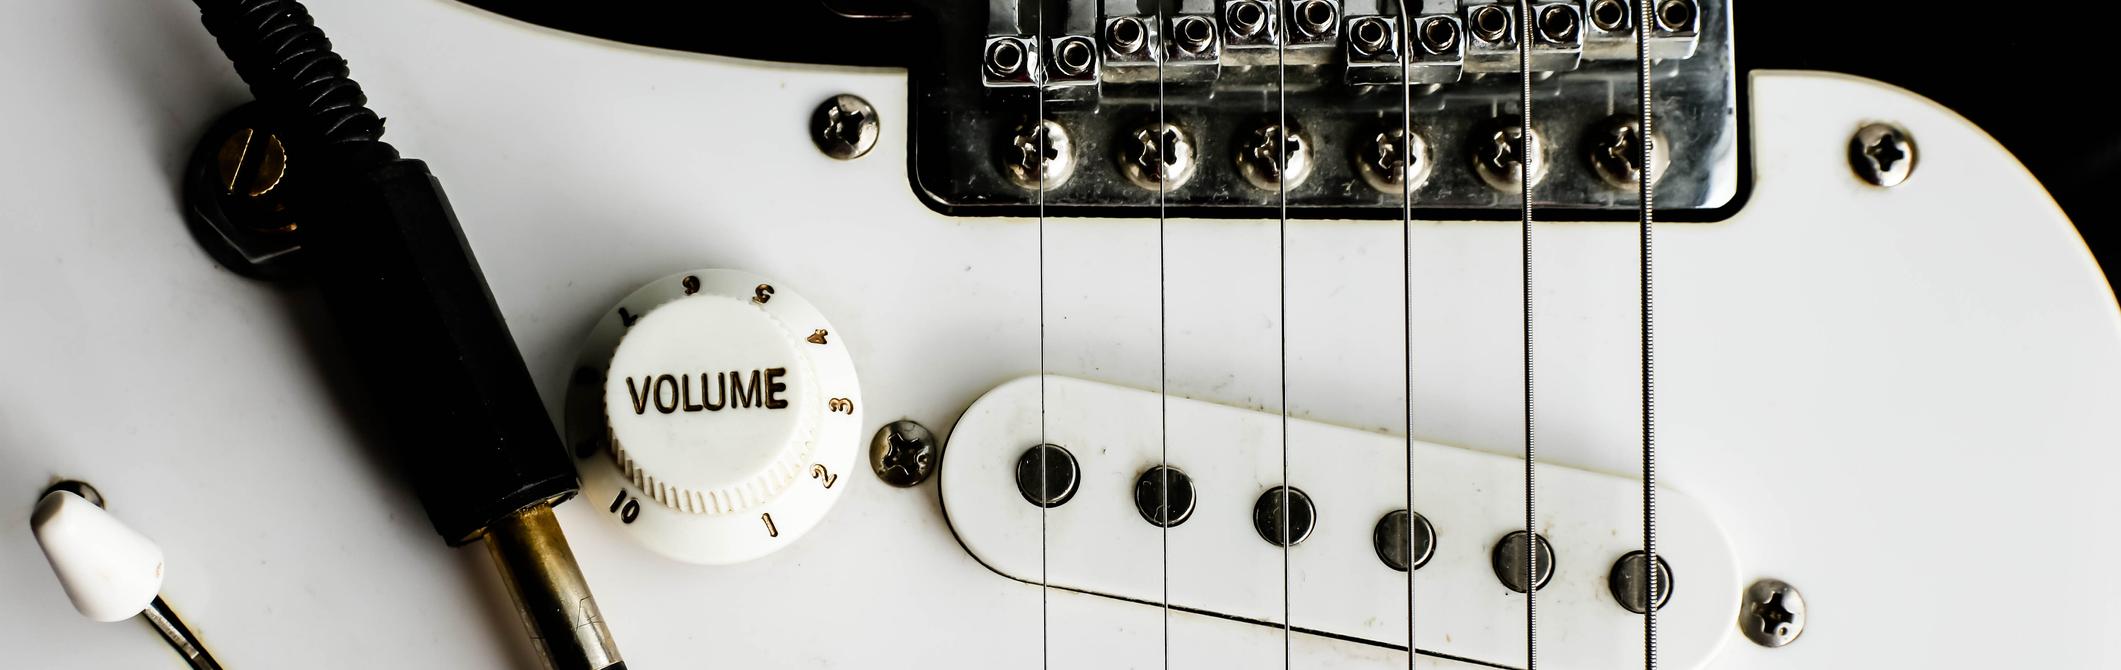 electric-guitar-white-black